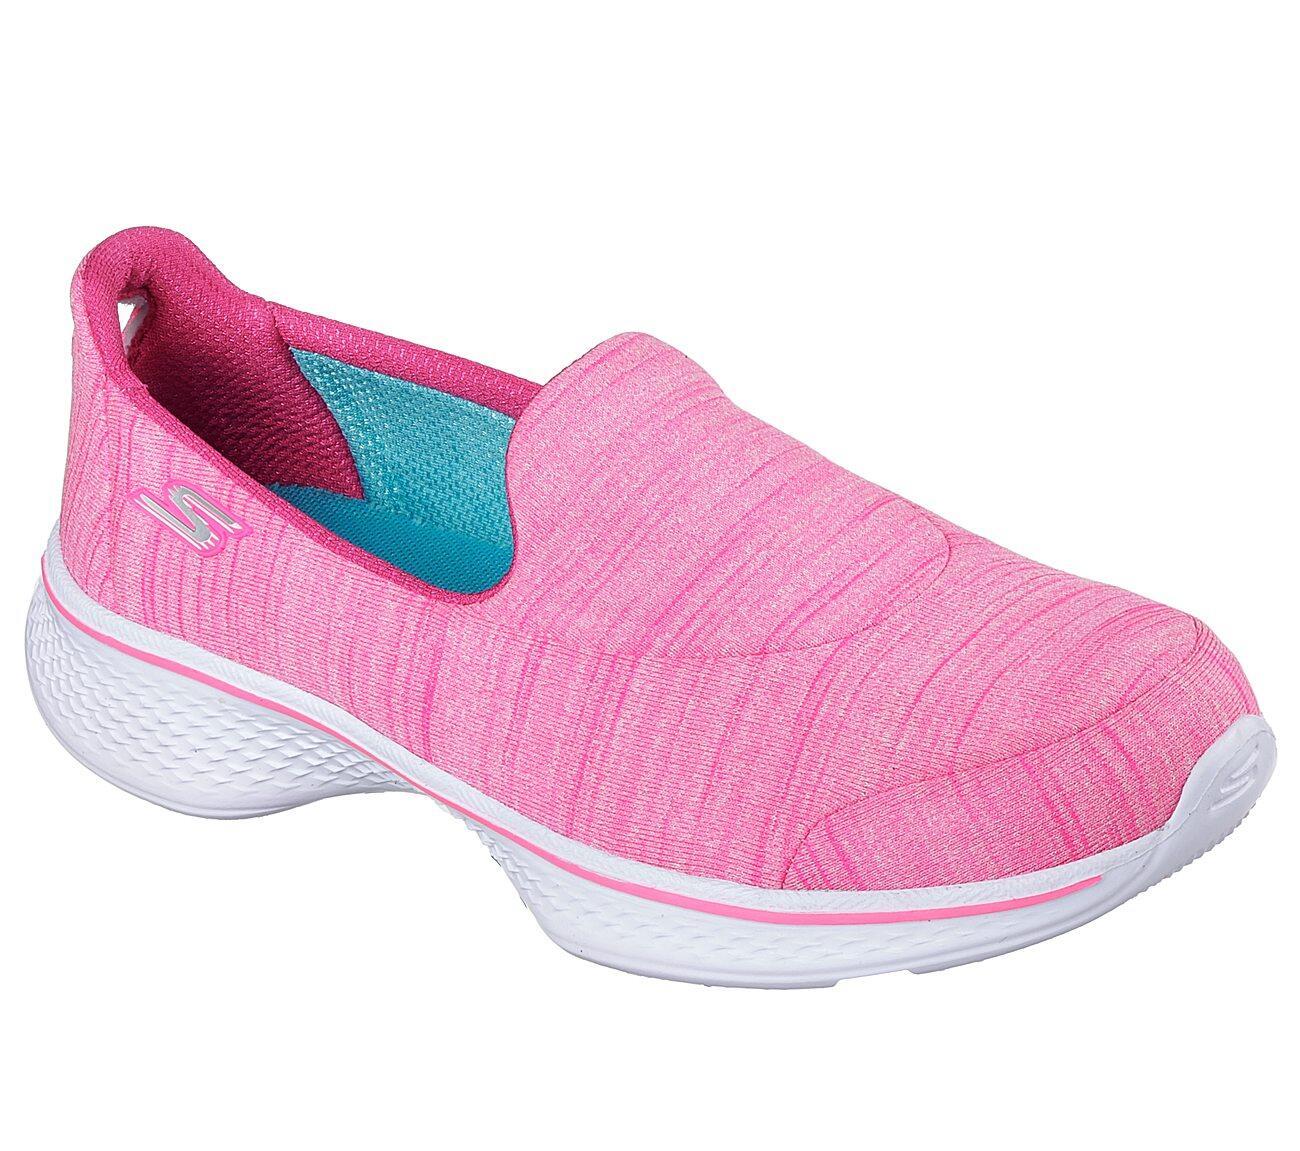 Skechers Girl GO WALK 4 SKECHERS GIRLS - 81122L-PNK